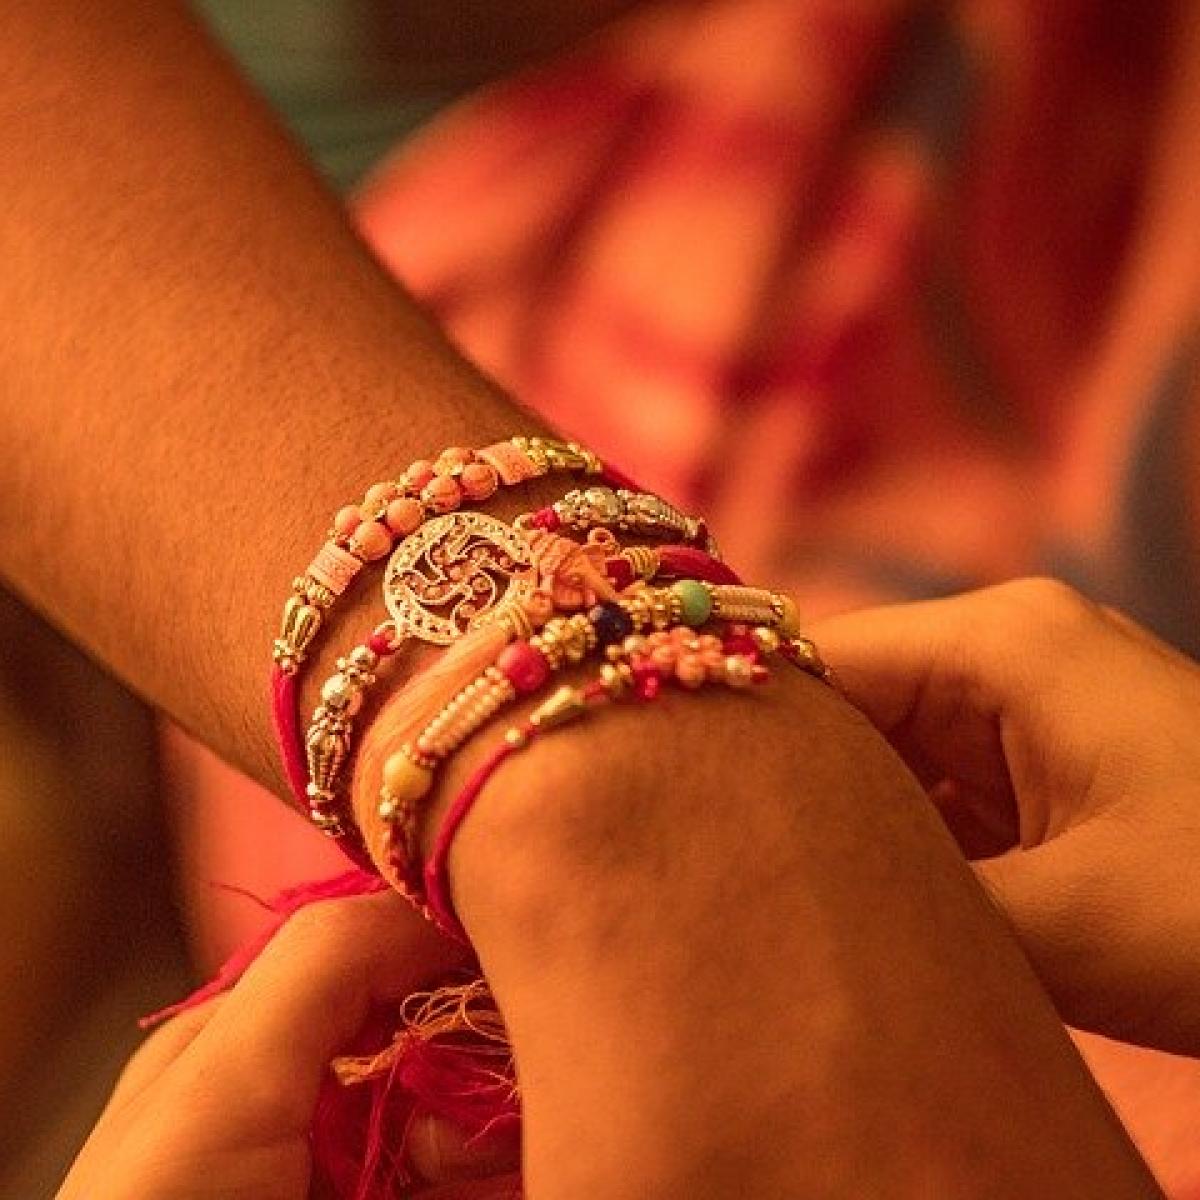 Did Mughals birth Raksha Bandhan? Historian Rana Safvi clarifies after online outrage